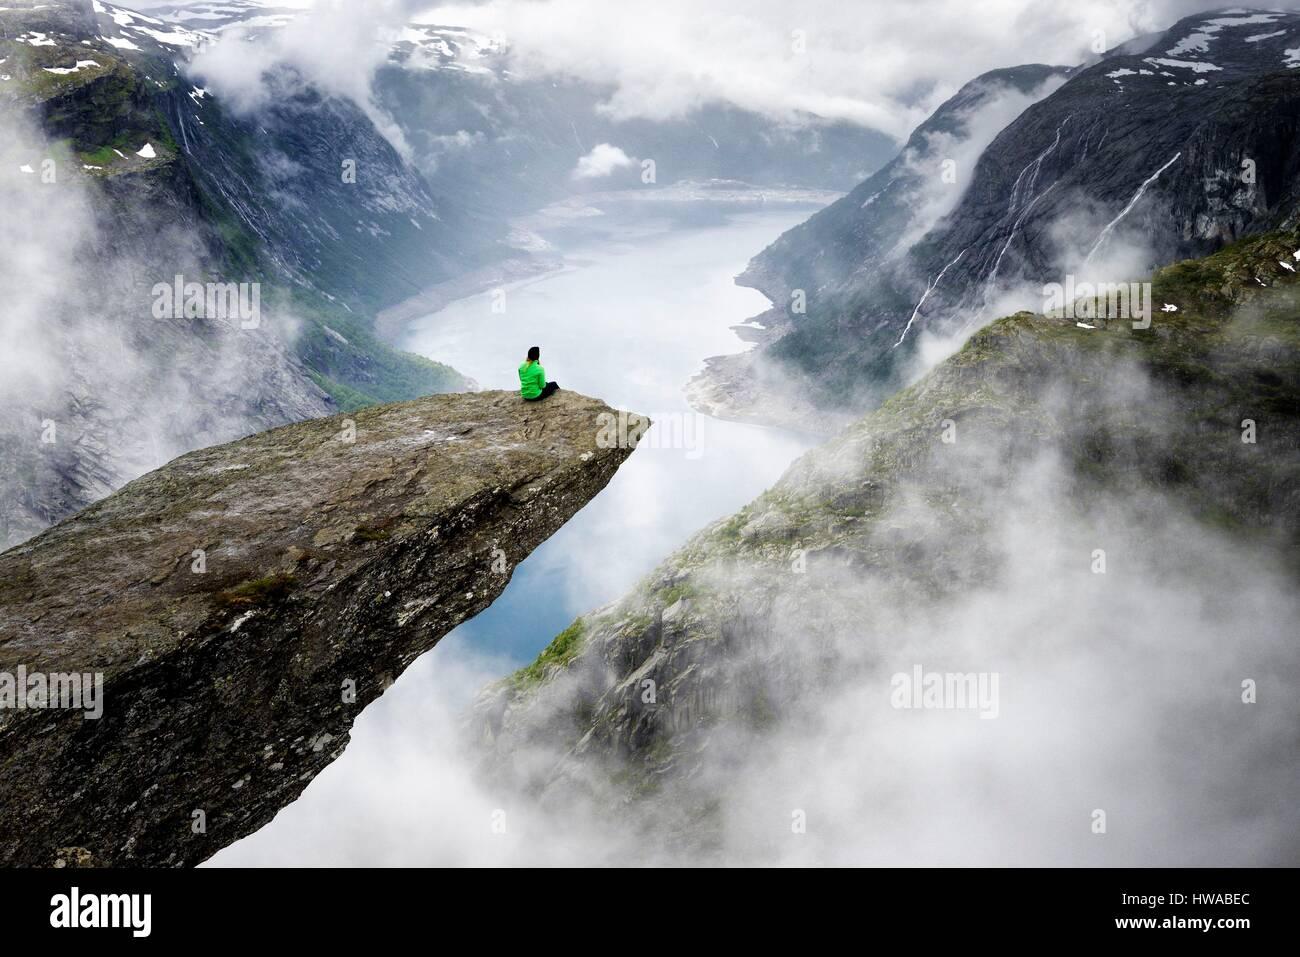 Norway, Hordaland, Hardangervidda region, Odda, Trolltunga (the troll's tongue) 700 metres above lake Ringedalsvatnet - Stock Image